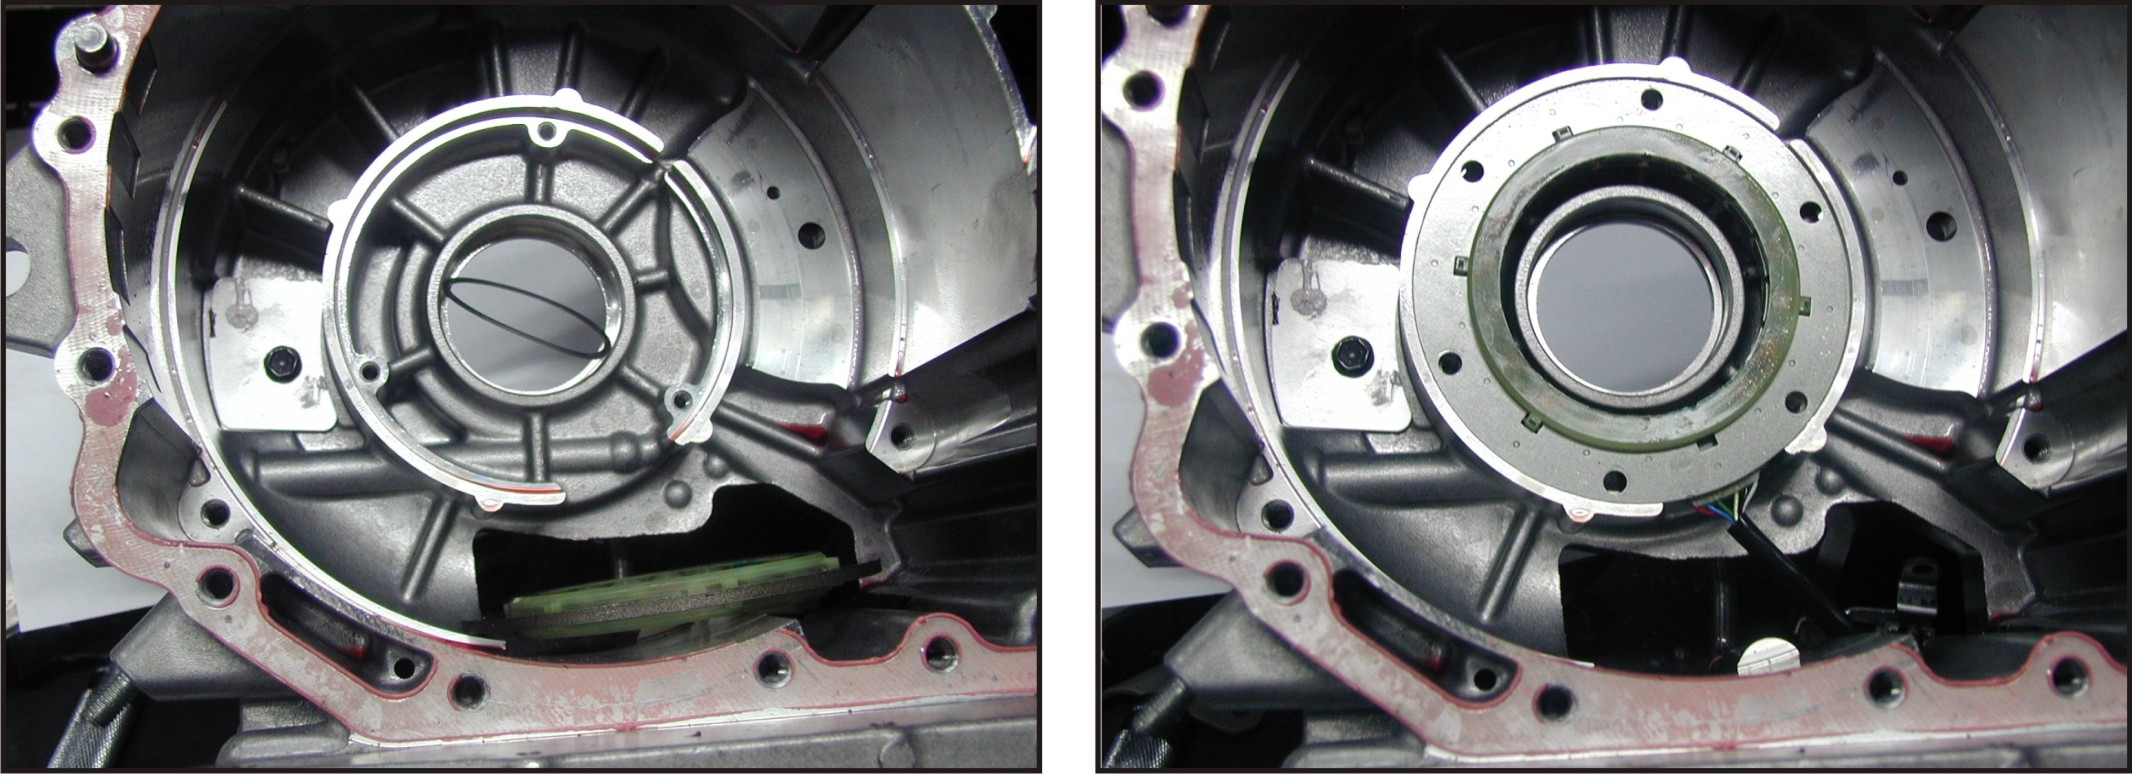 ATSG Ford Escape Hybrid Preliminary Information - Figure 36